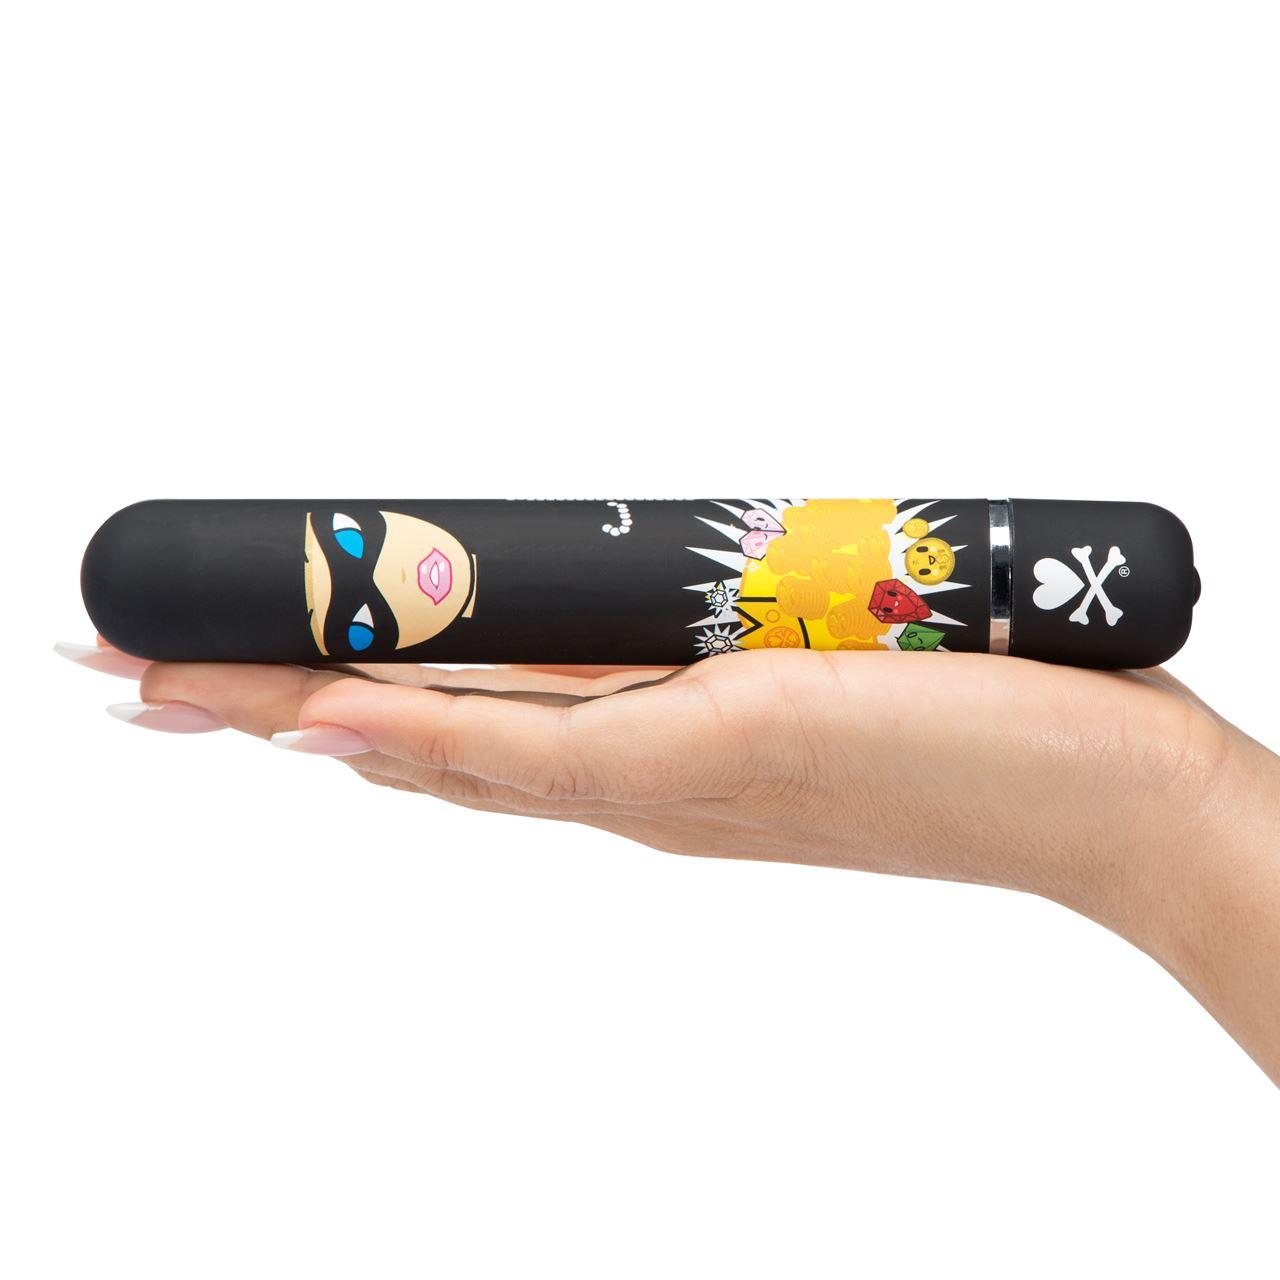 0014963_tokidoki-7-function-classic-vibrator-black-robber-woman_l3hrmtendmizvbuf.jpeg